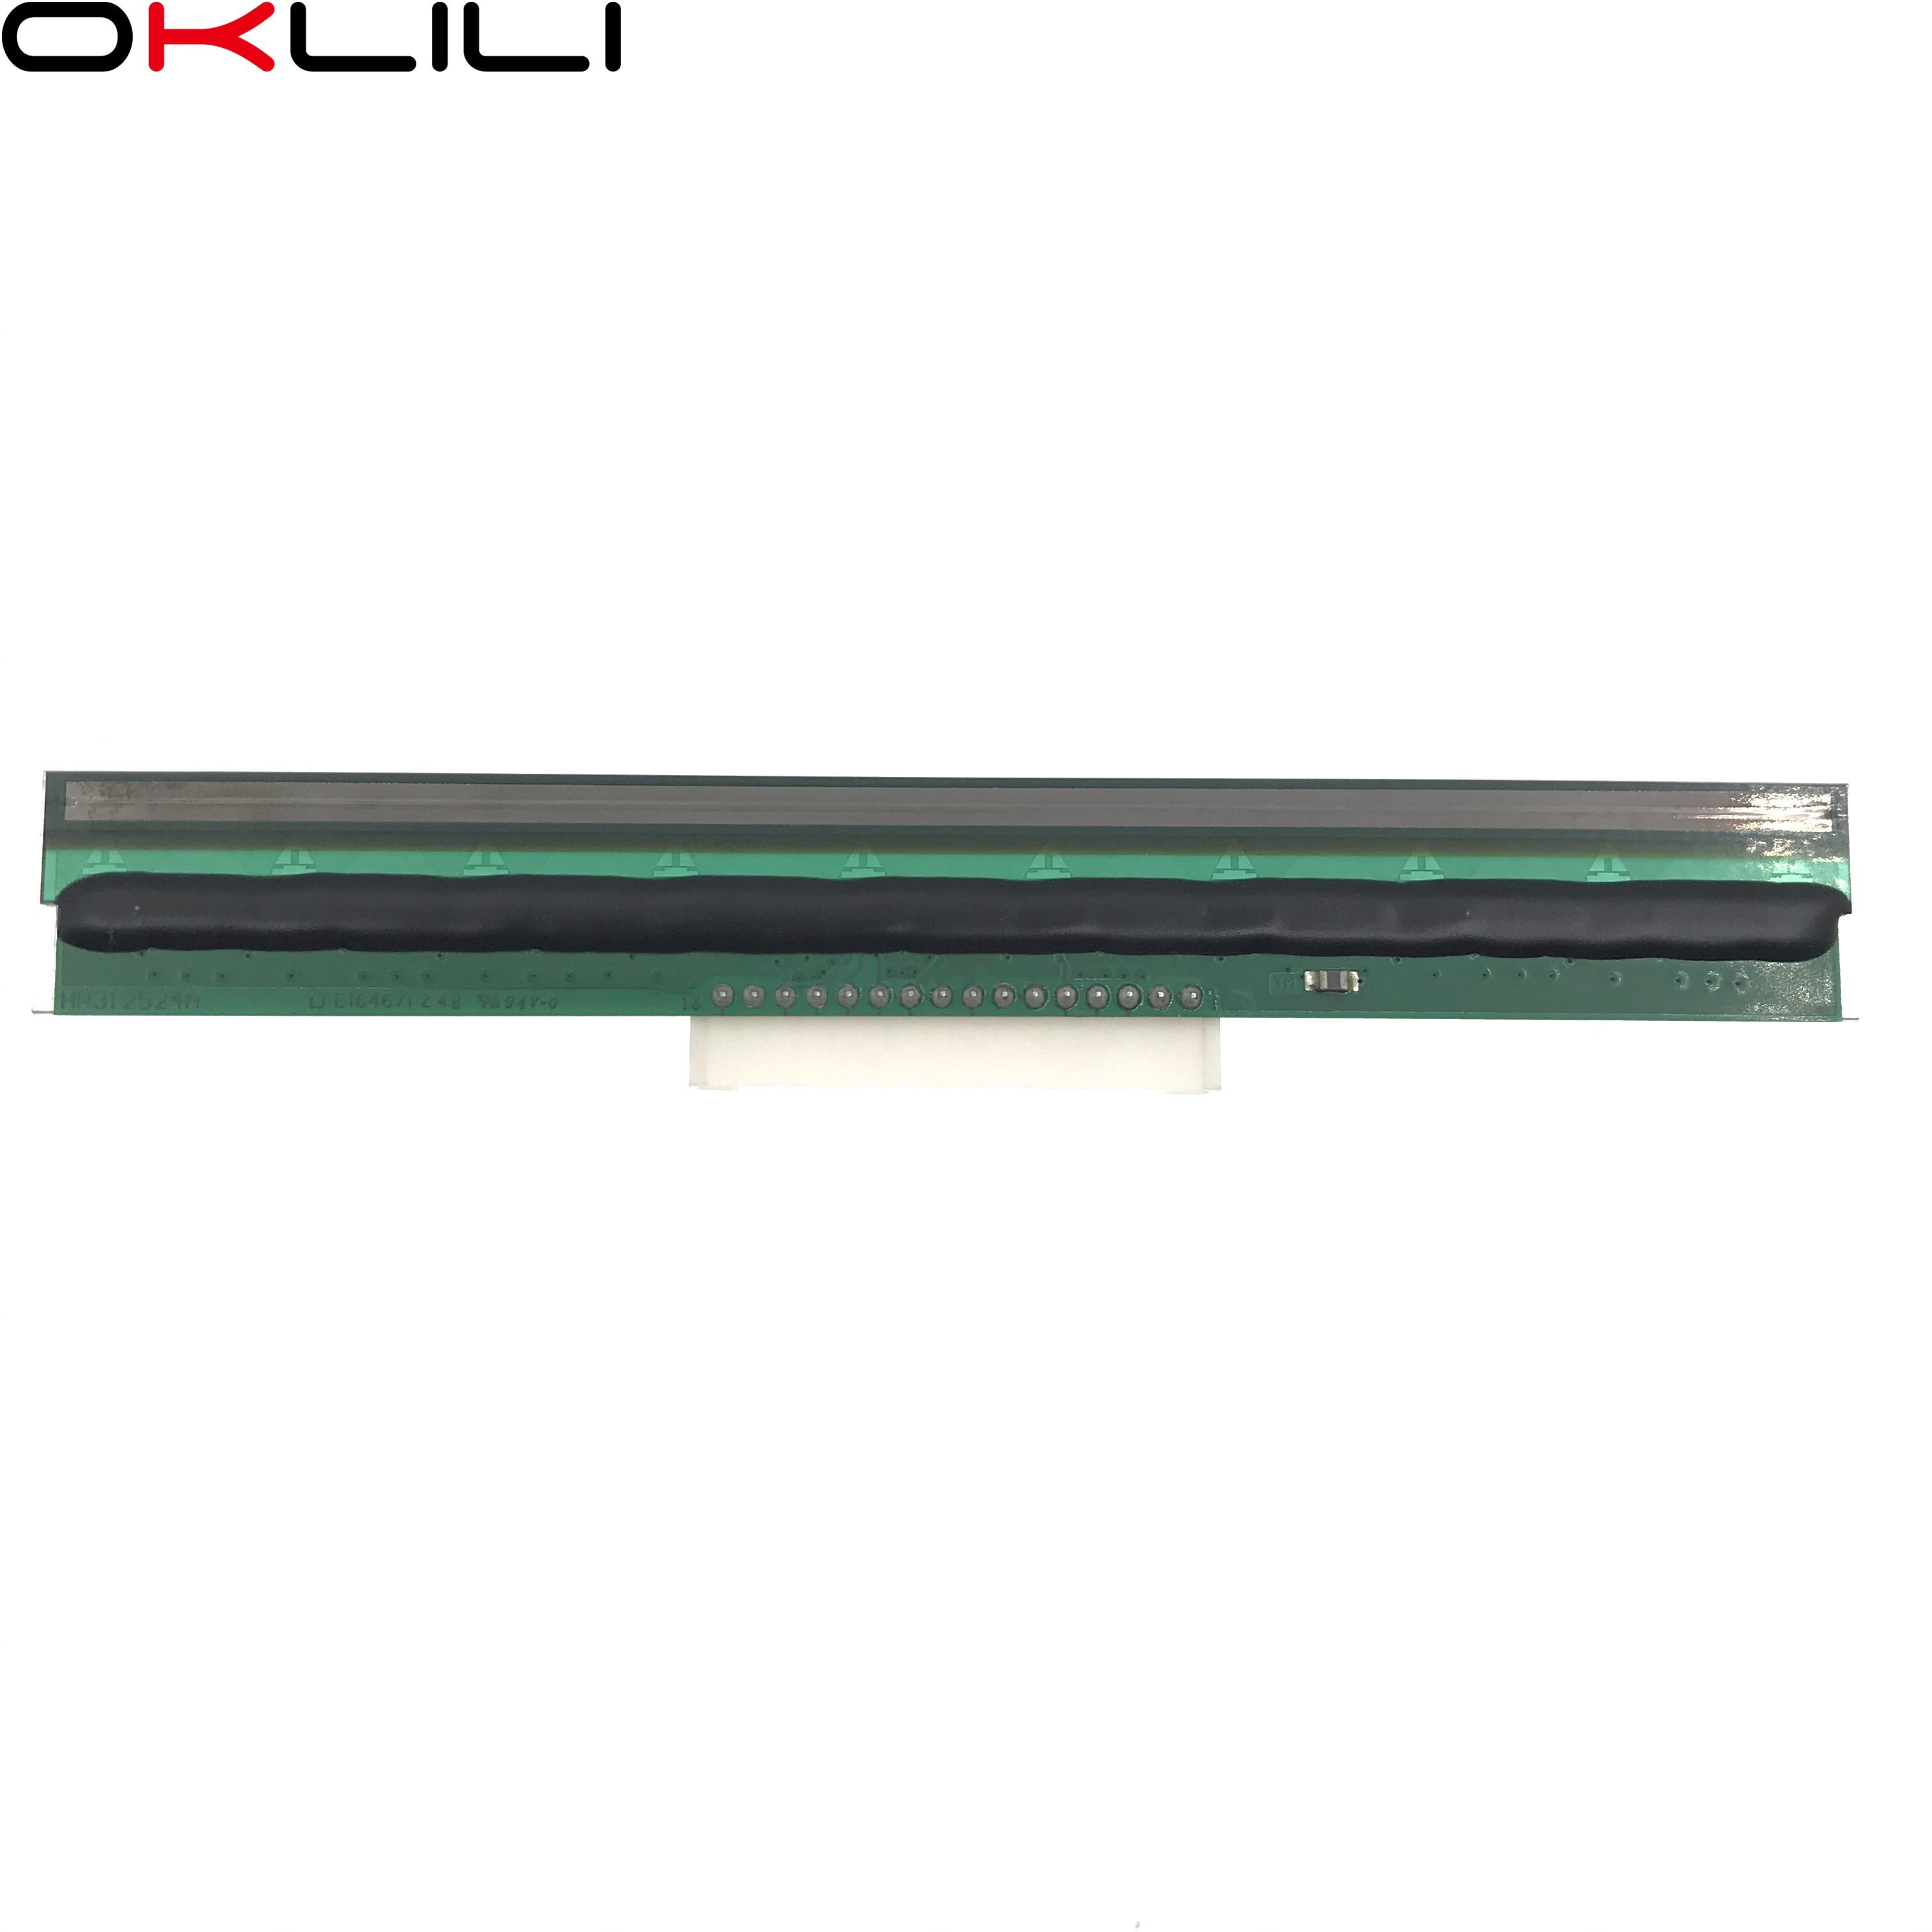 1 X الباركود الحرارية طابعة رأس الطباعة رأس الطباعة 203 ديسيبل متوحد الخواص ل Godex G300 G500-U EZ-1000 EZ-1100 زائد EZ-1105 ZA124-U ZA128-U RT700